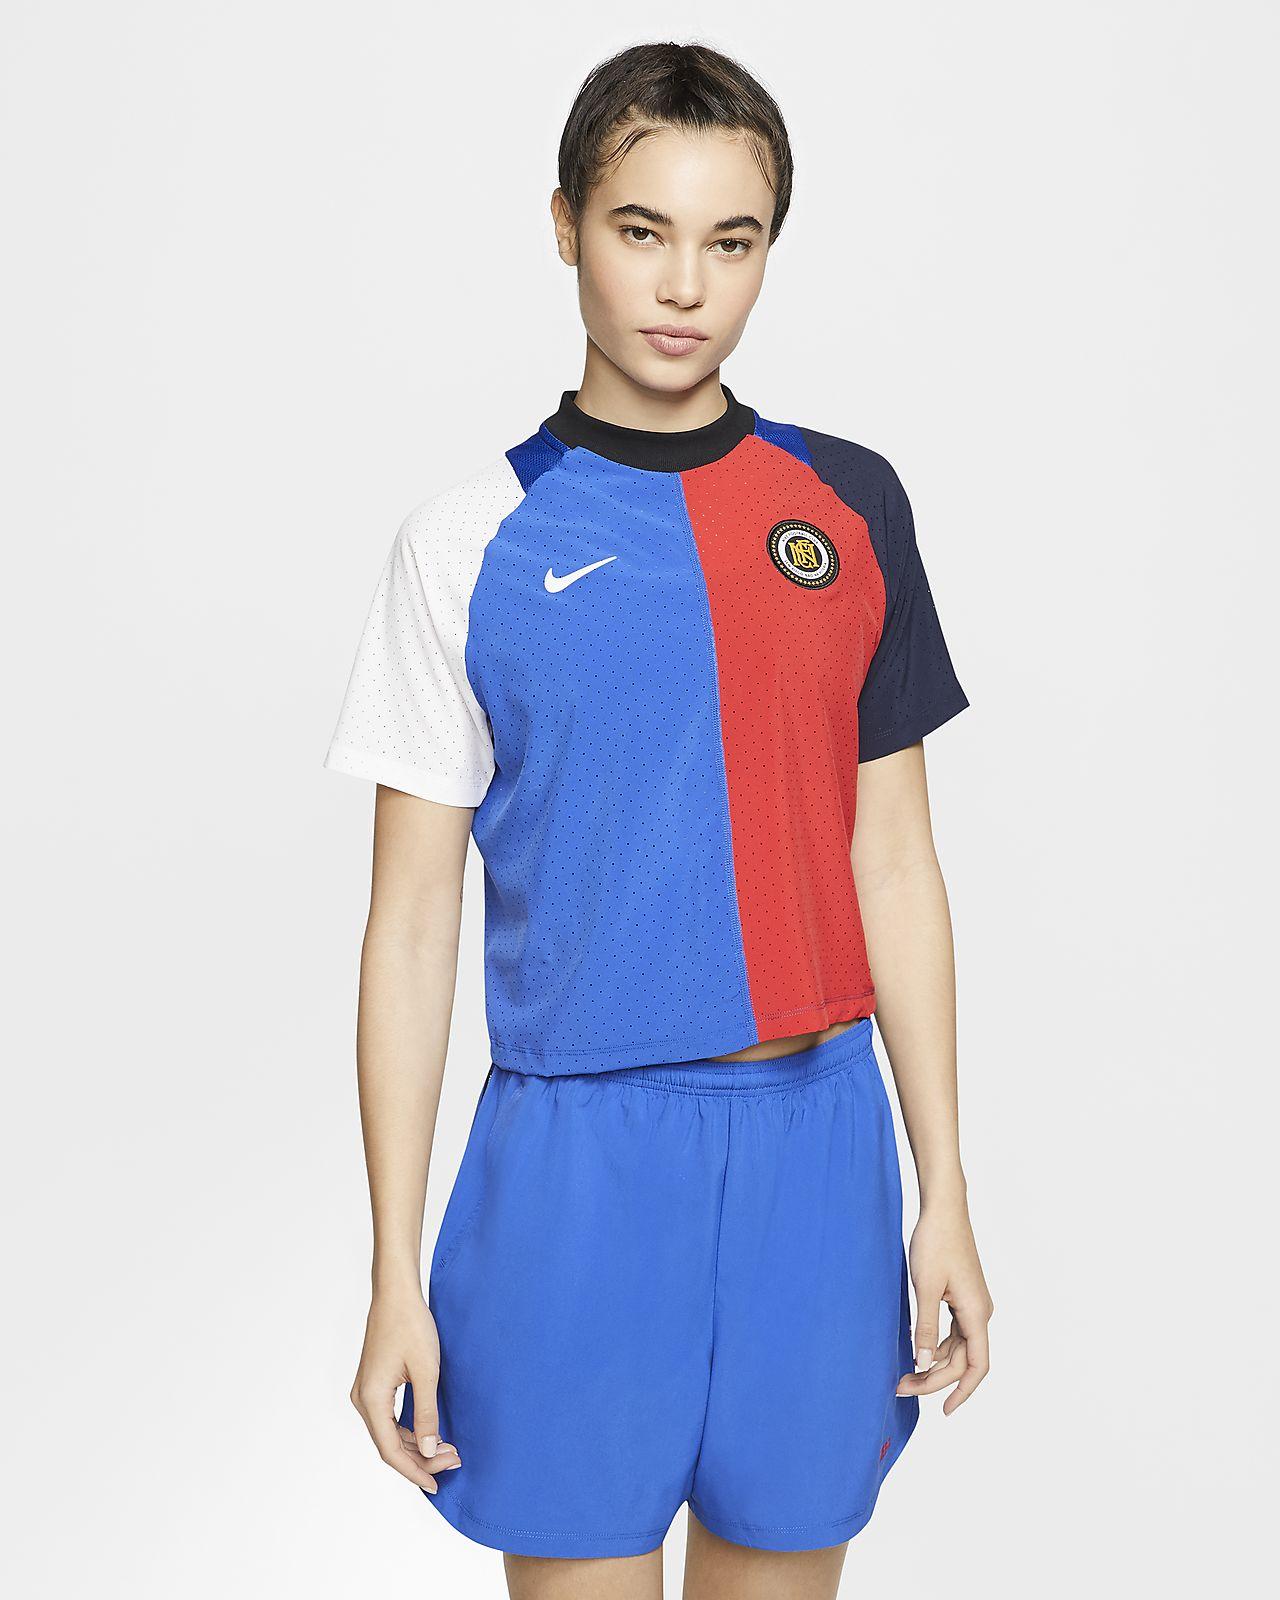 Nike F.C. Women's Football Shirt